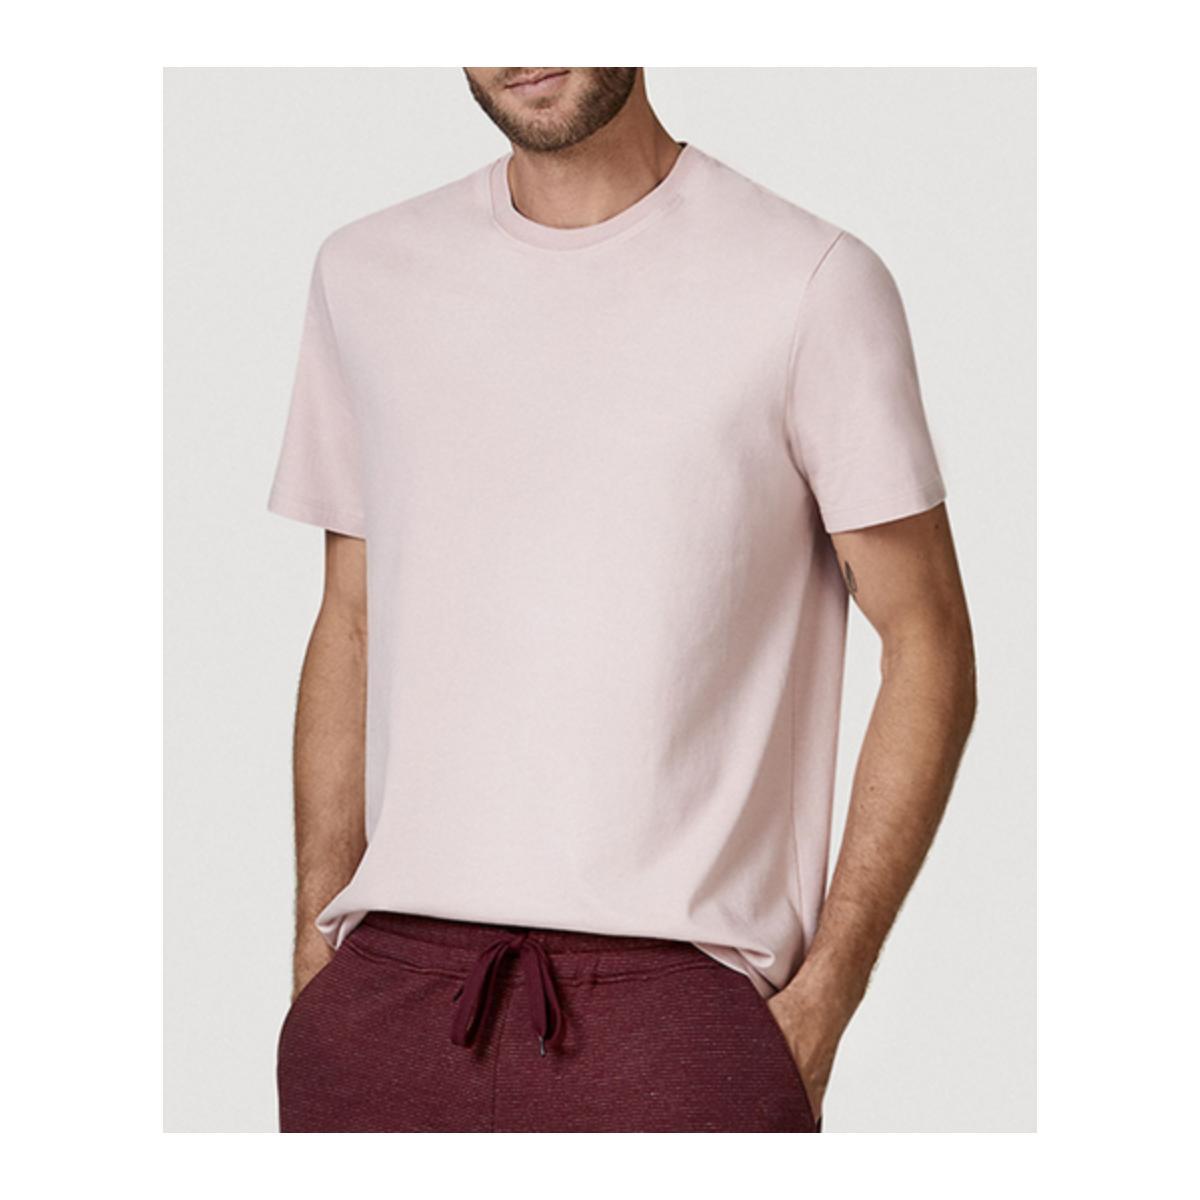 Camiseta Masculina Hering 0227 Krqen Rosa Claro